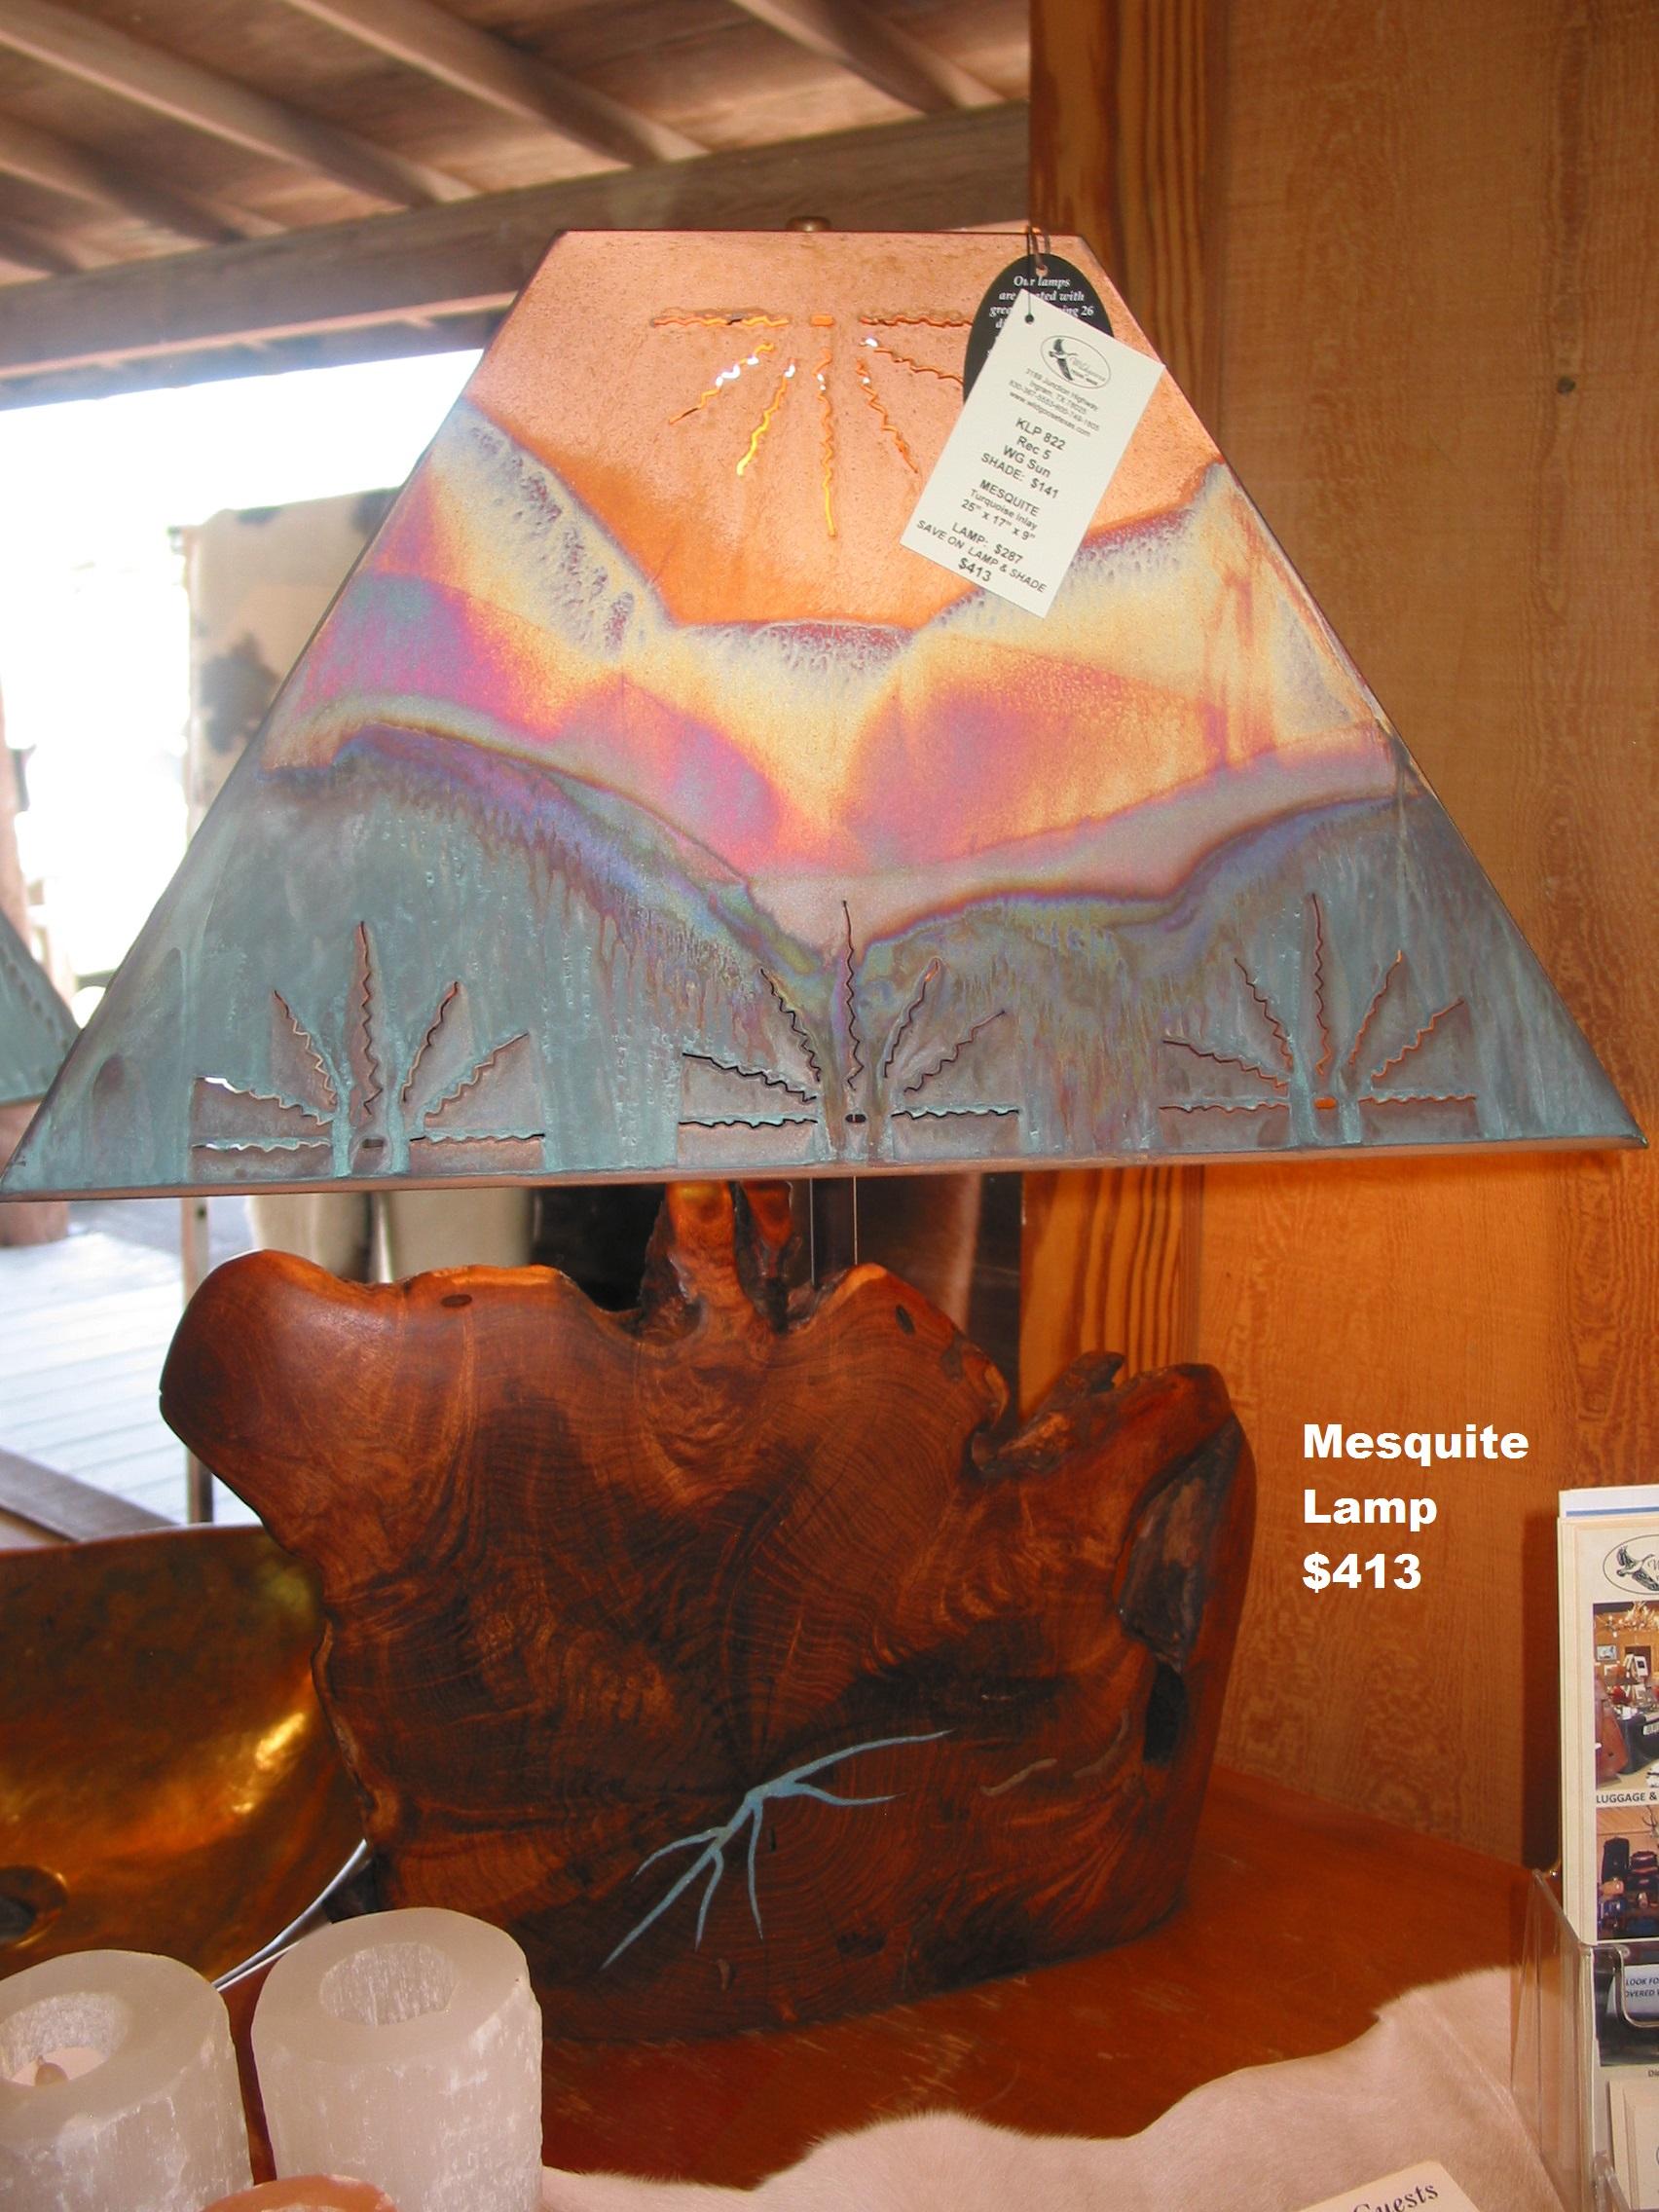 Custom Mesquite Lamps With Copper Shades Wildgoose Mfg